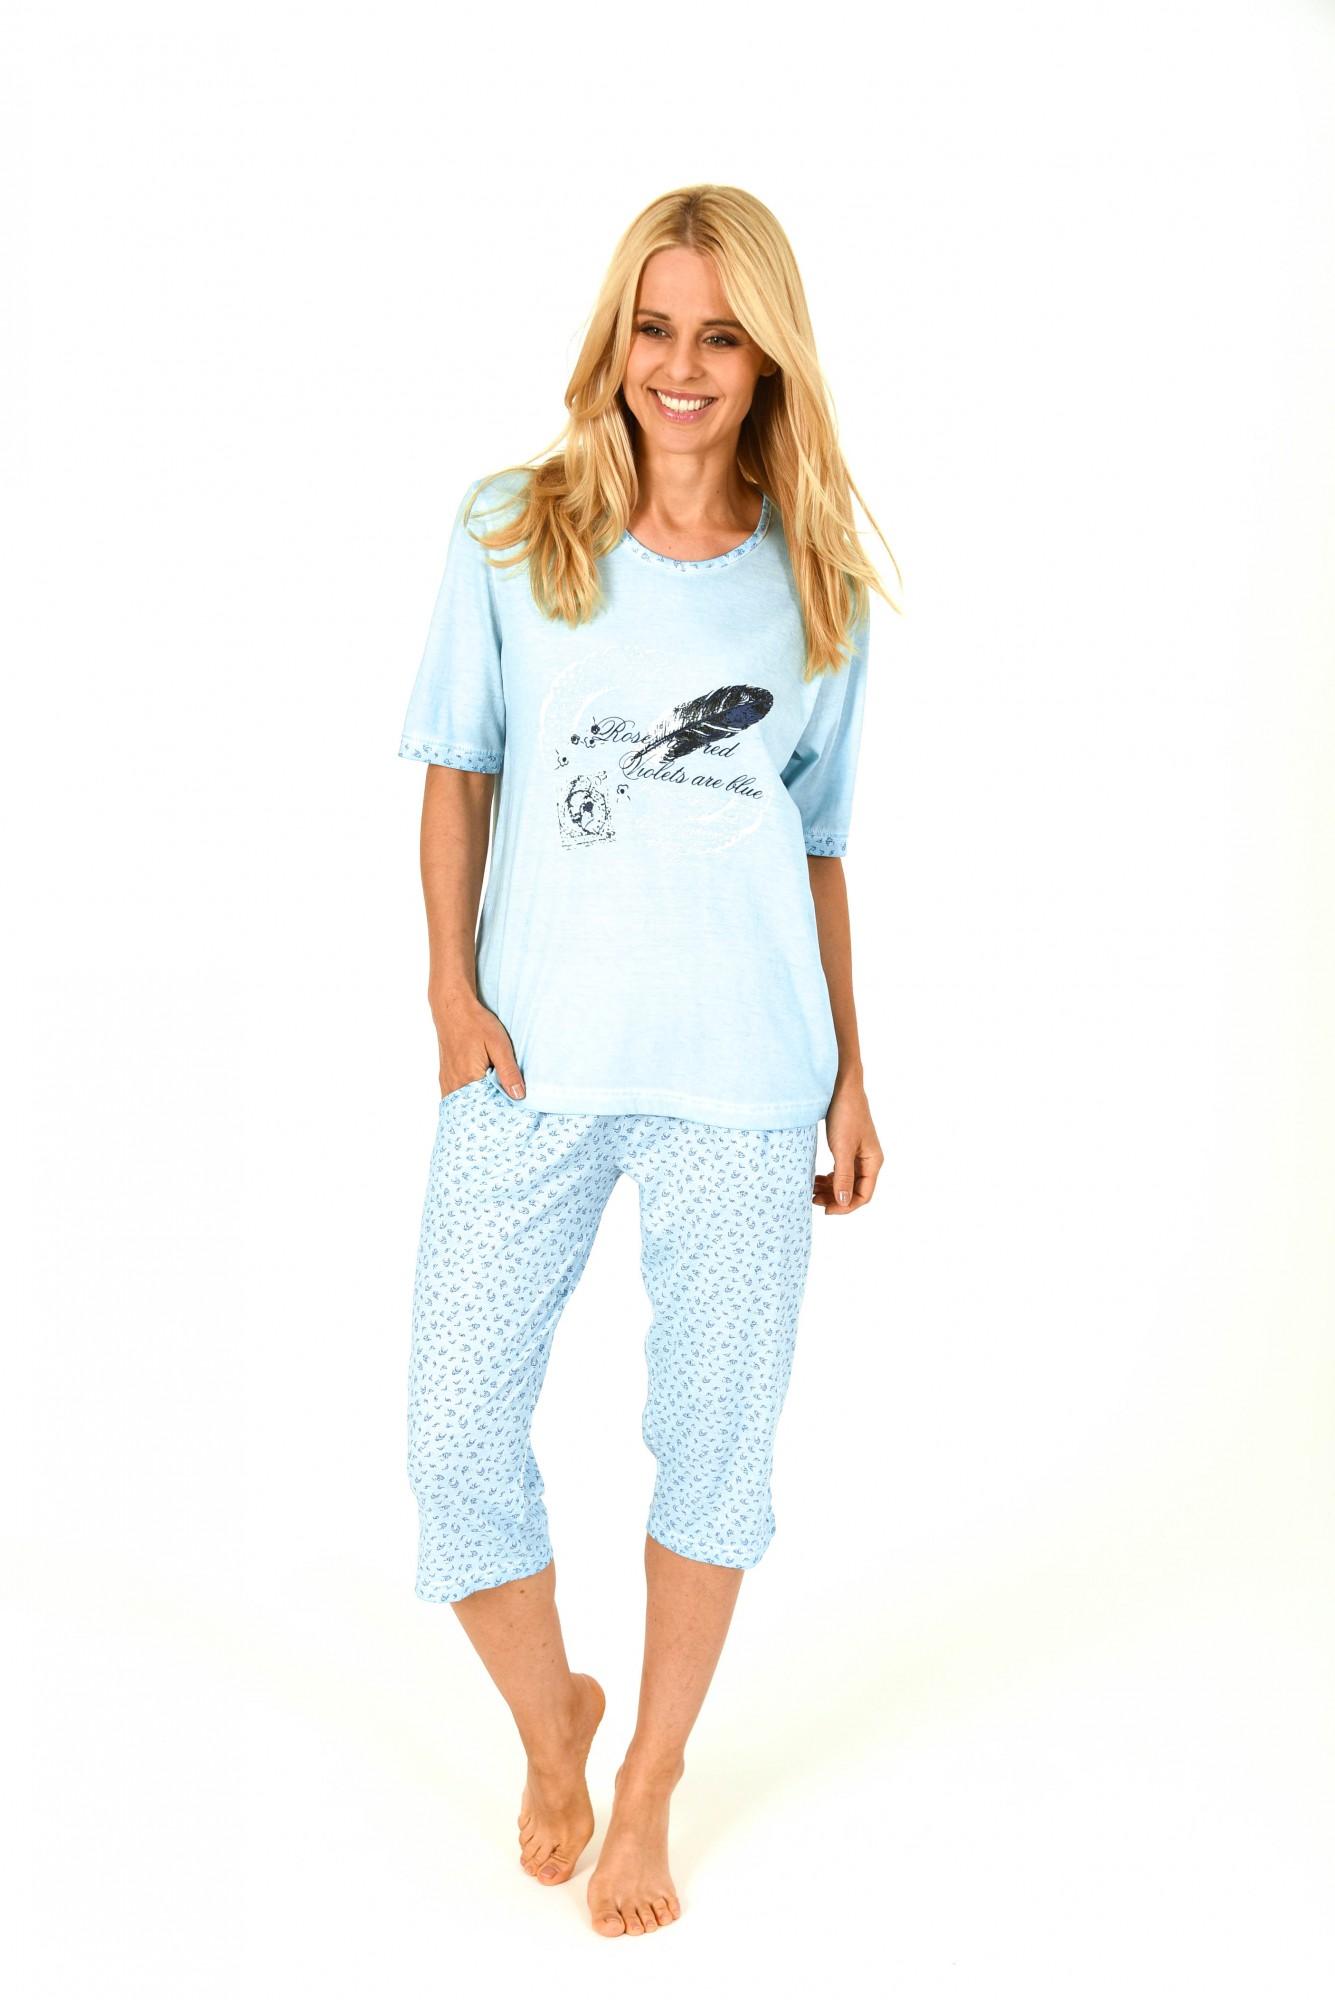 Lässiger Damen Capri Pyjama kurzarm in gewaschener Optik – 171 204 90 820